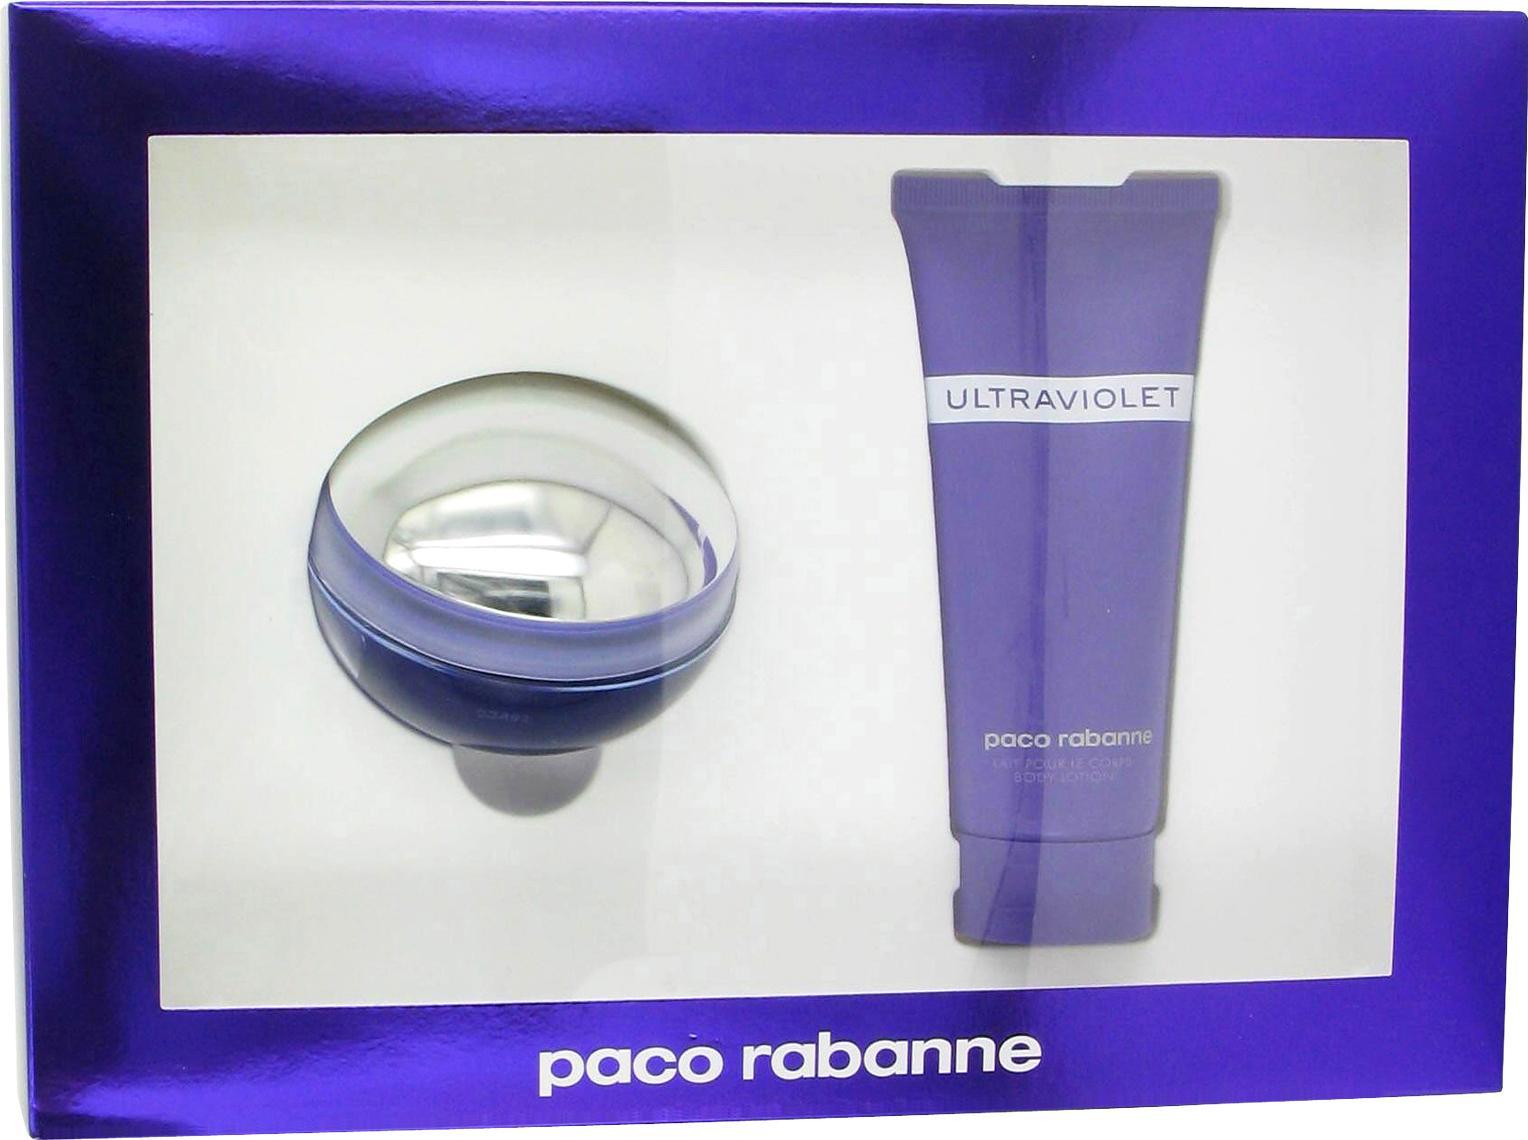 Paco Rabanne Ultraviolet Gift Set Eau de Parfum Spray 2.7 oz & Body Lotion 3.4 oz 2 pcs at Sears.com